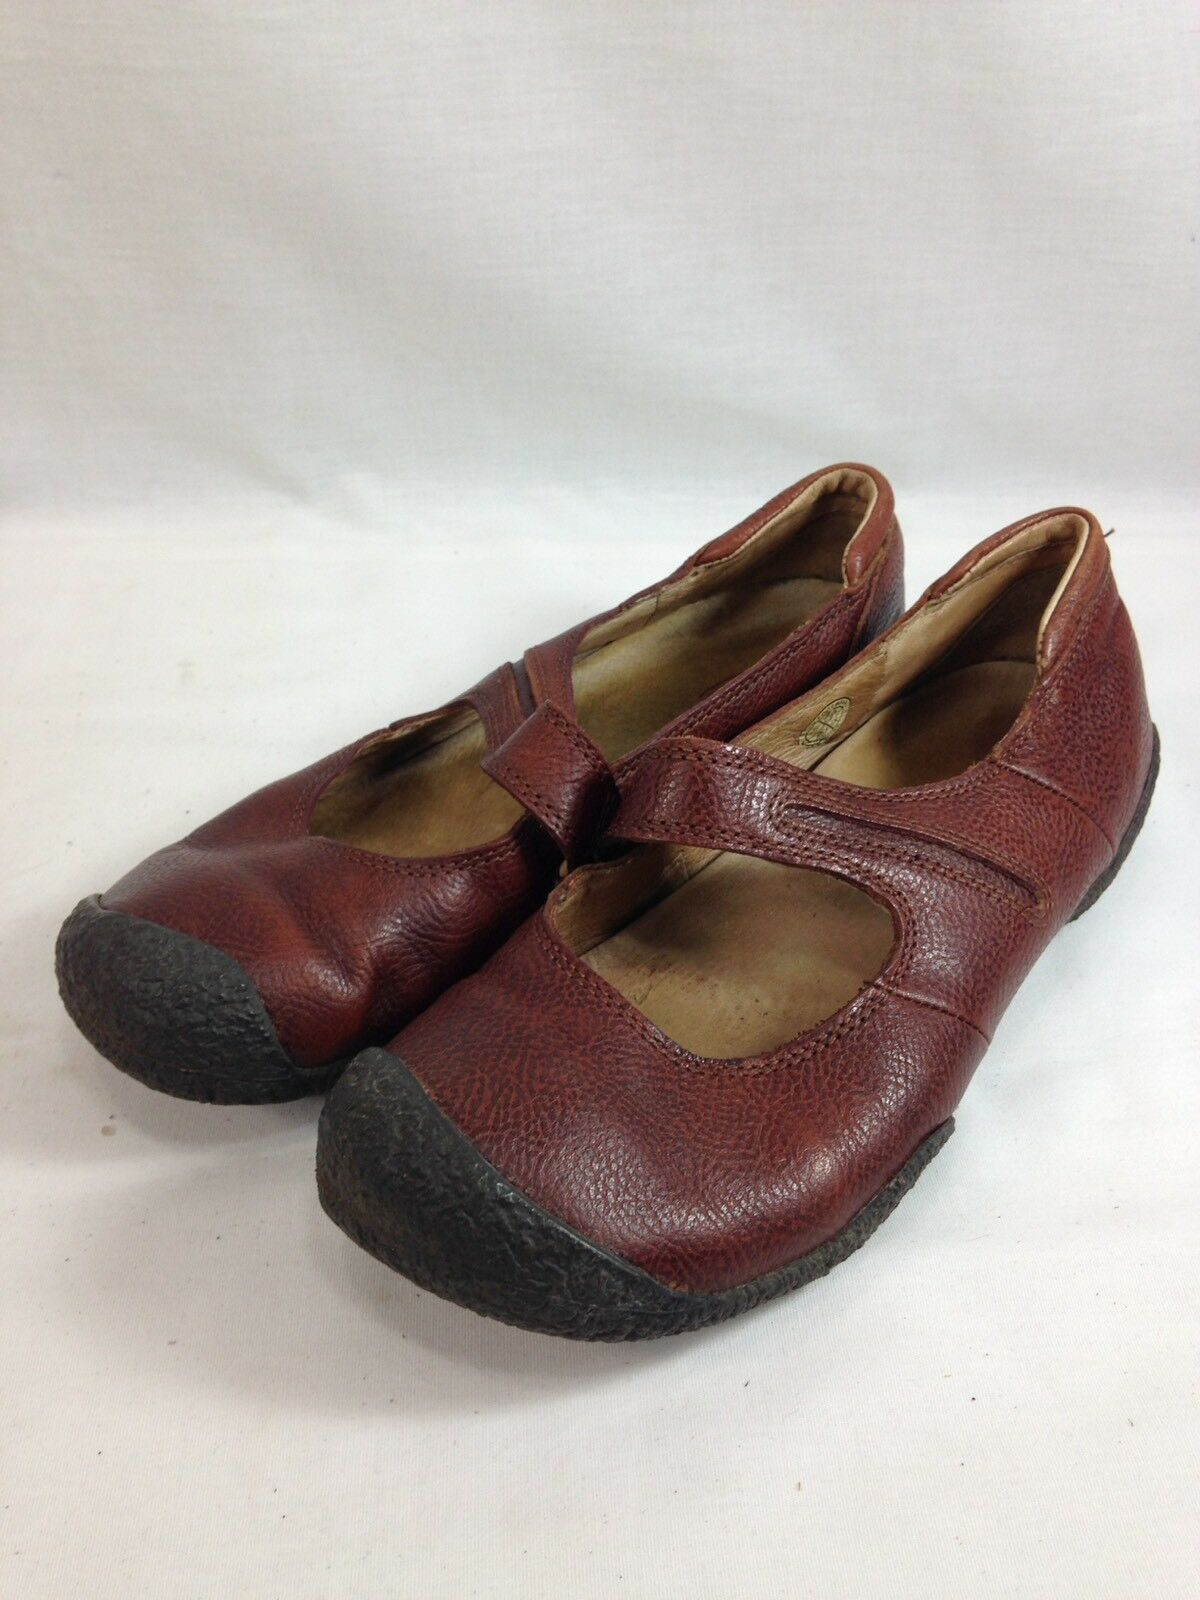 Keen Mary Jane Scarpe Donna 9.5 marrone Pelle Comfort Slip On Flats Casual Dress